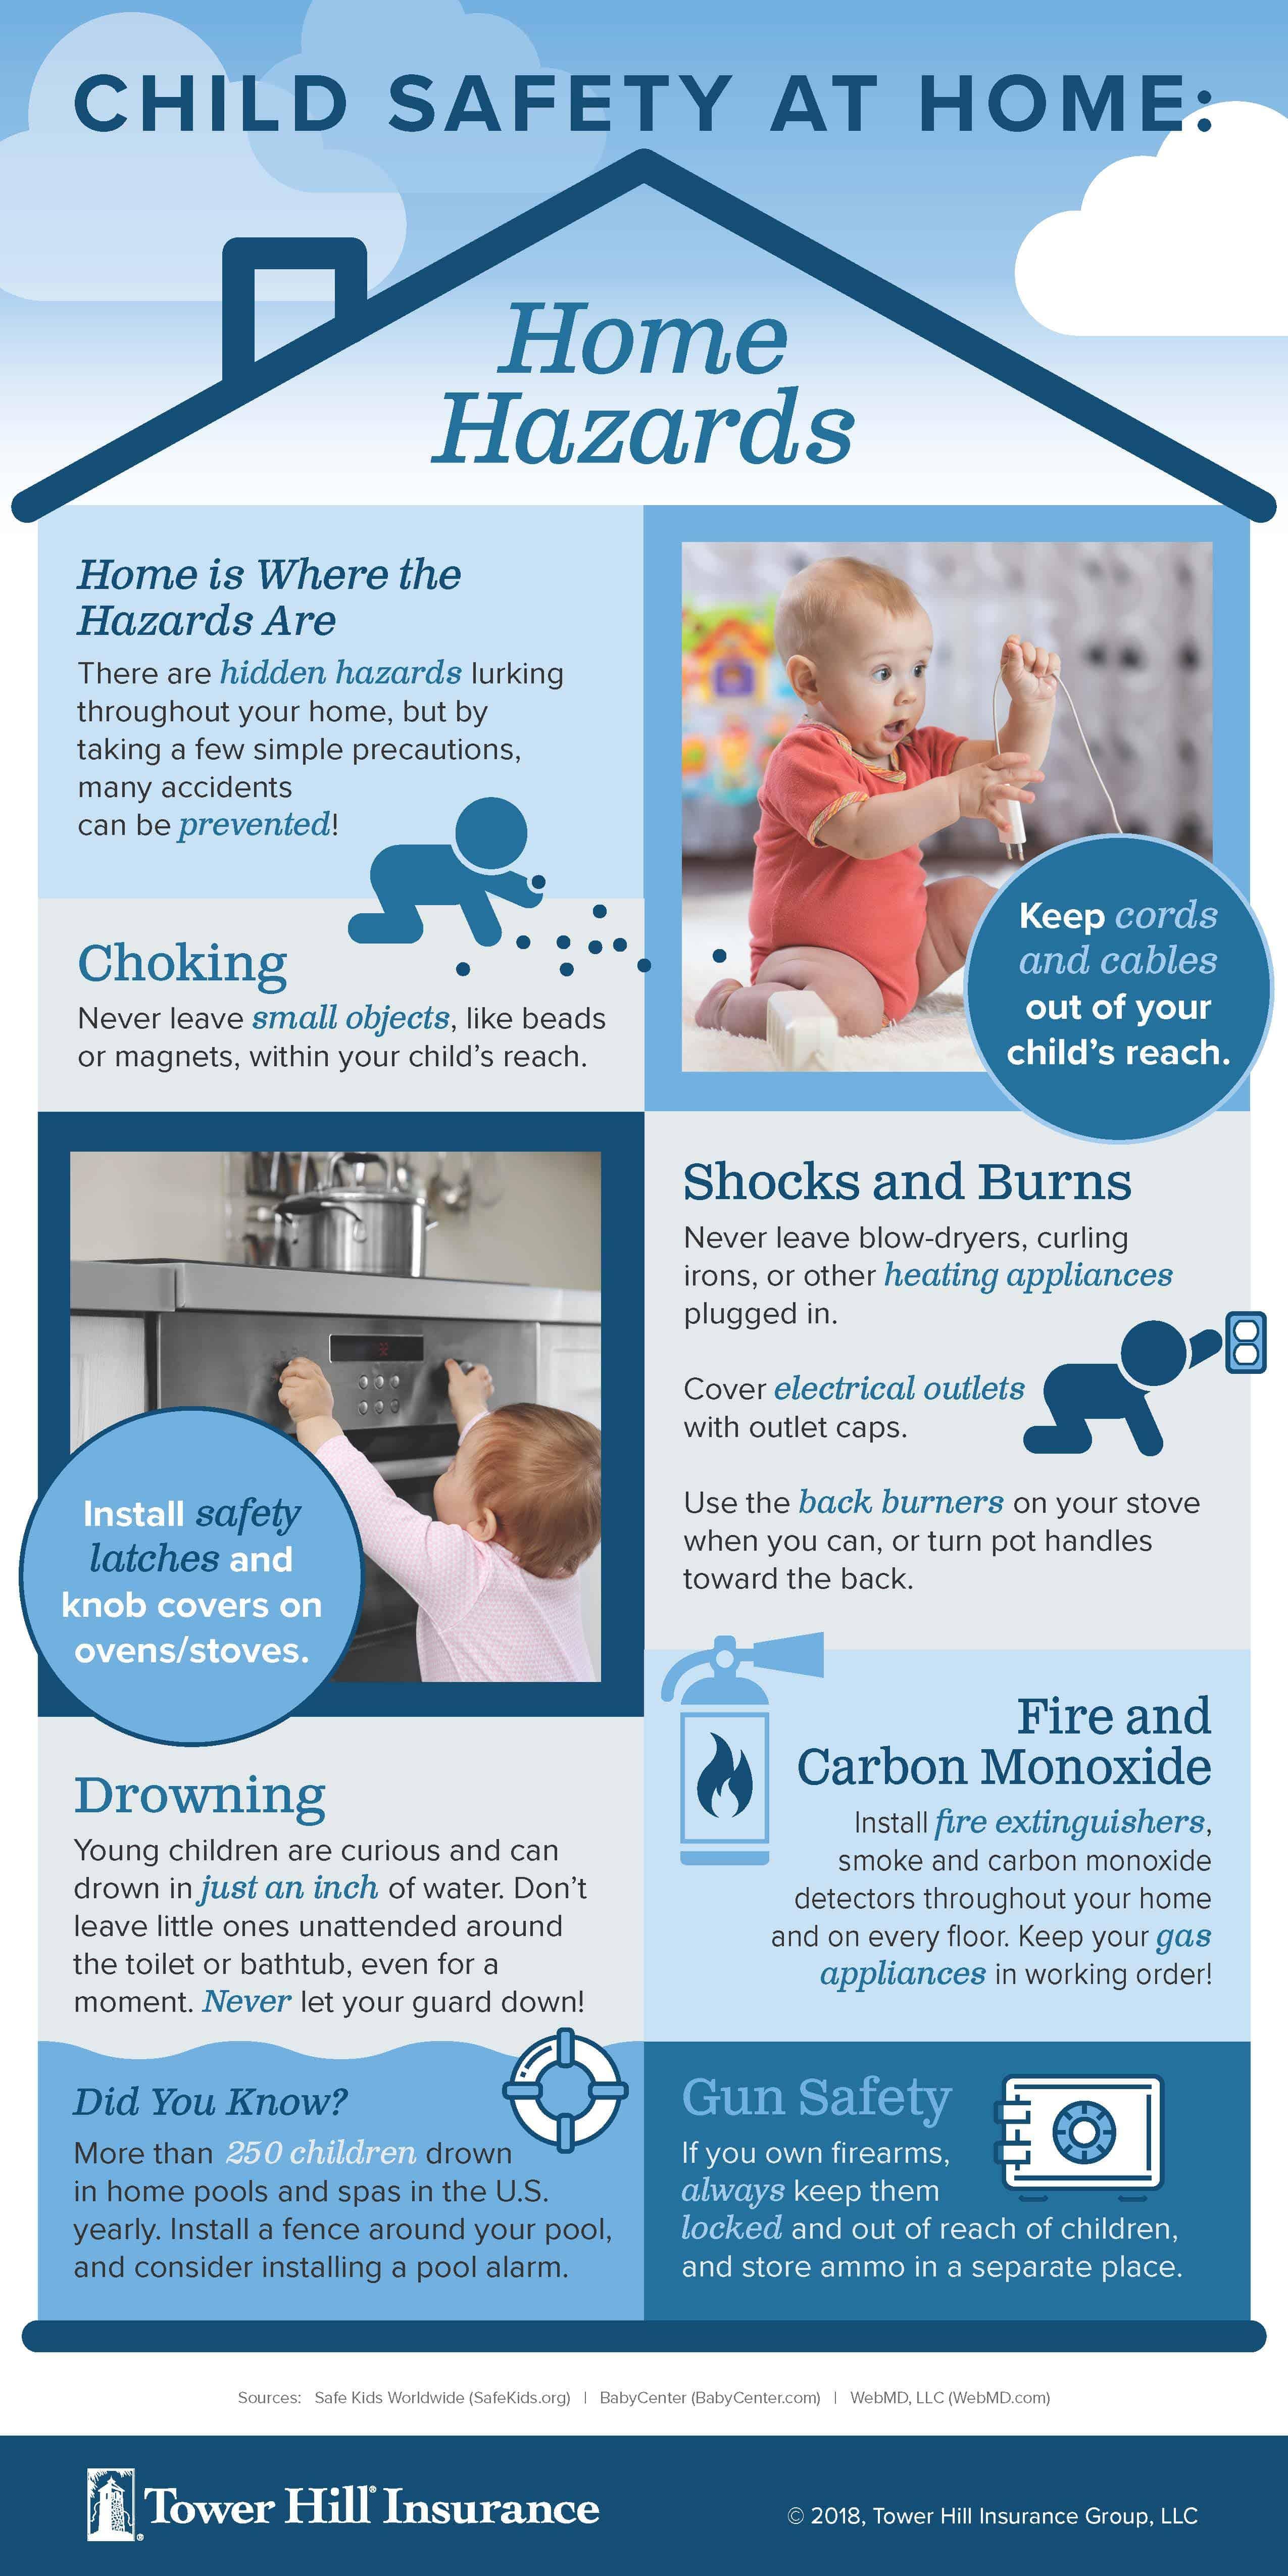 Child Safety at Home: Home Hazards